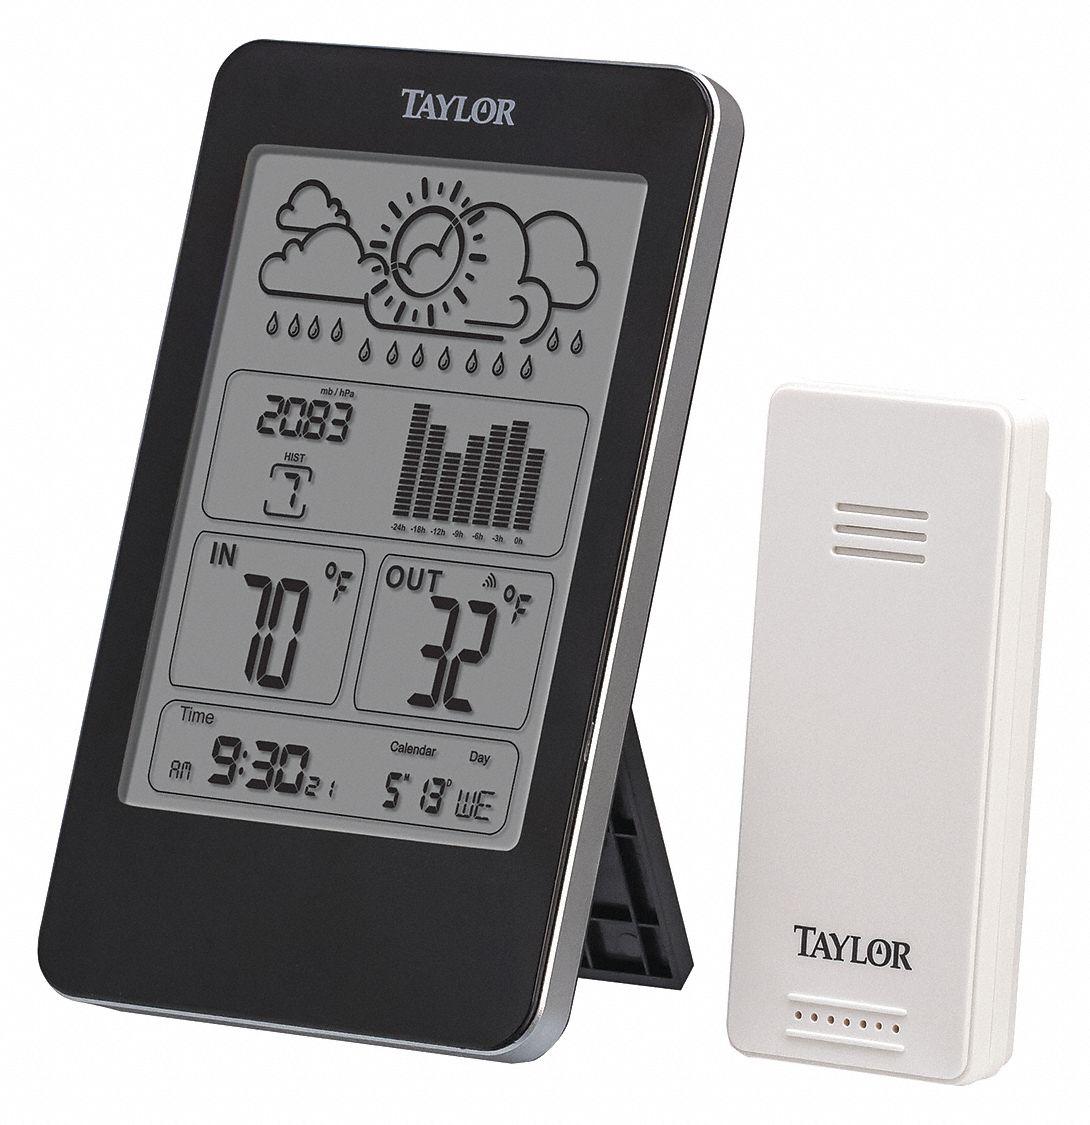 2752N TAYLOR Wireless Multizone Thermometer,32-122F